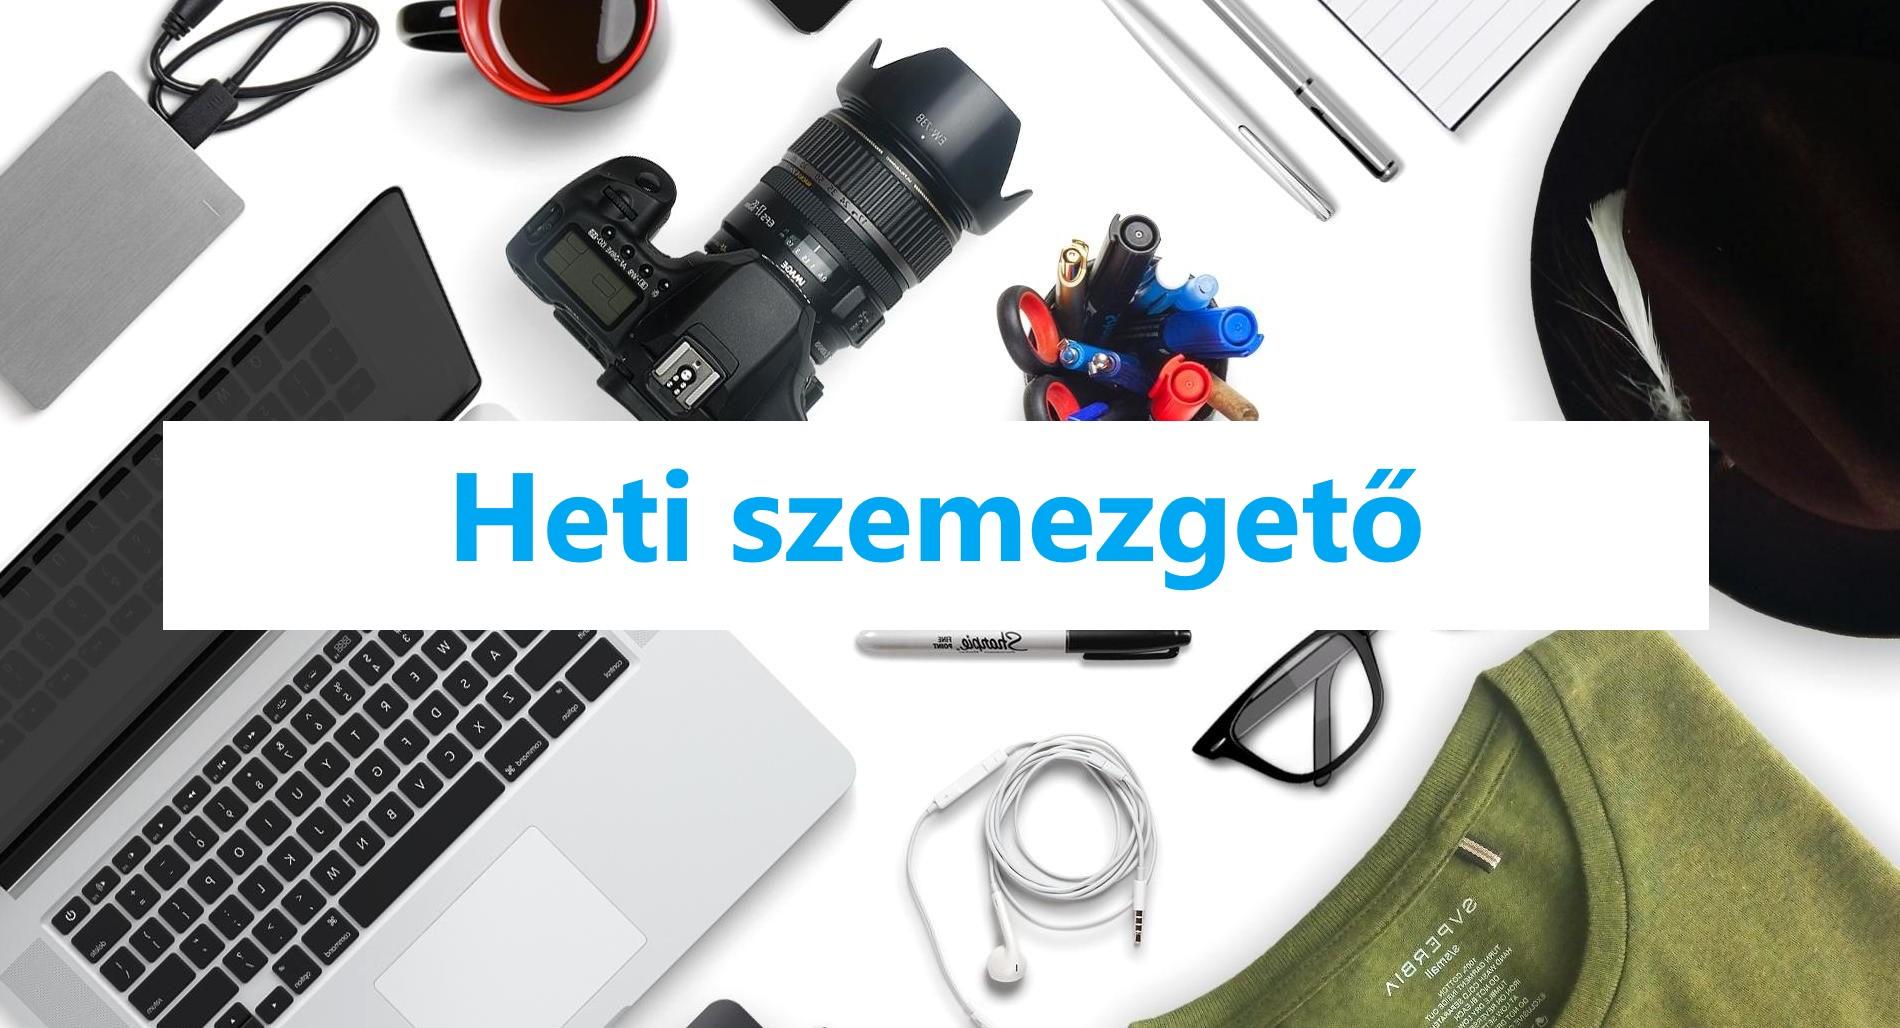 heti_szemezgeto_uj_55.jpg